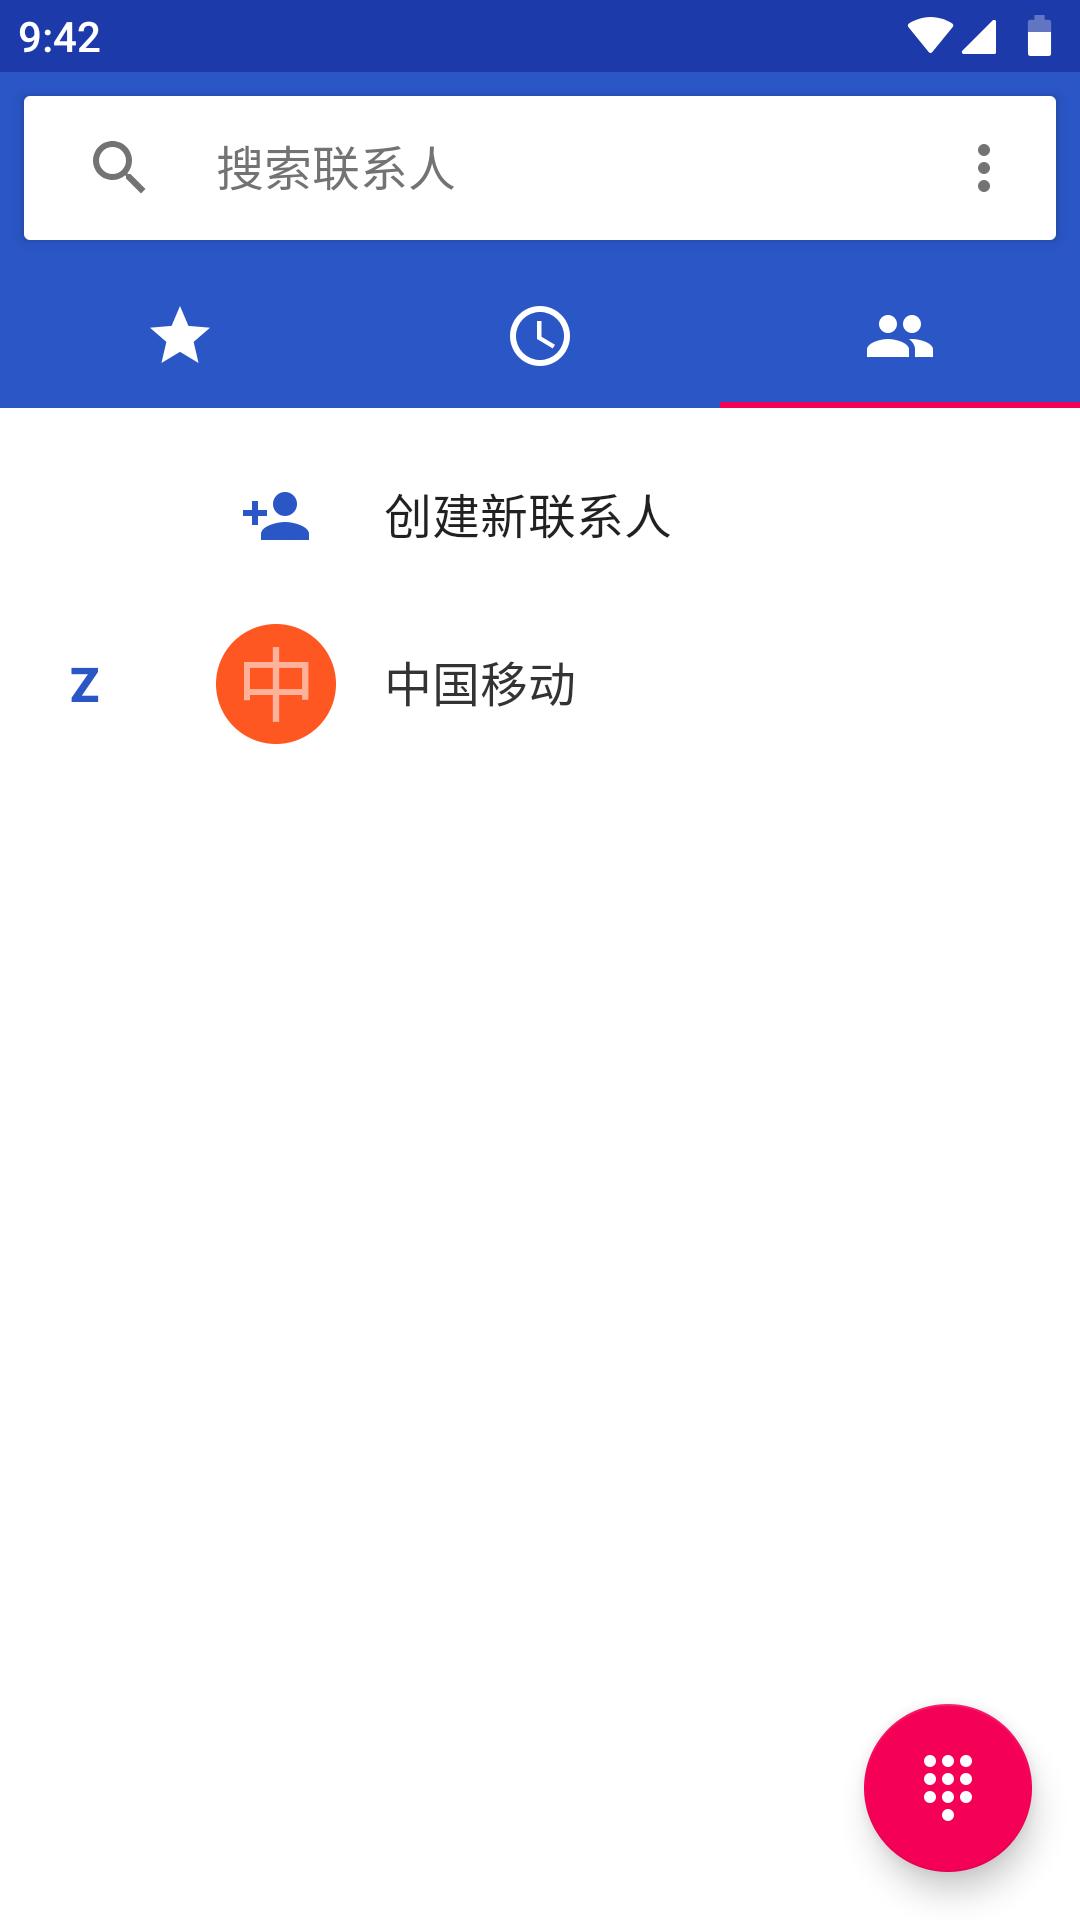 Screenshot_电话_20181008-094244.png